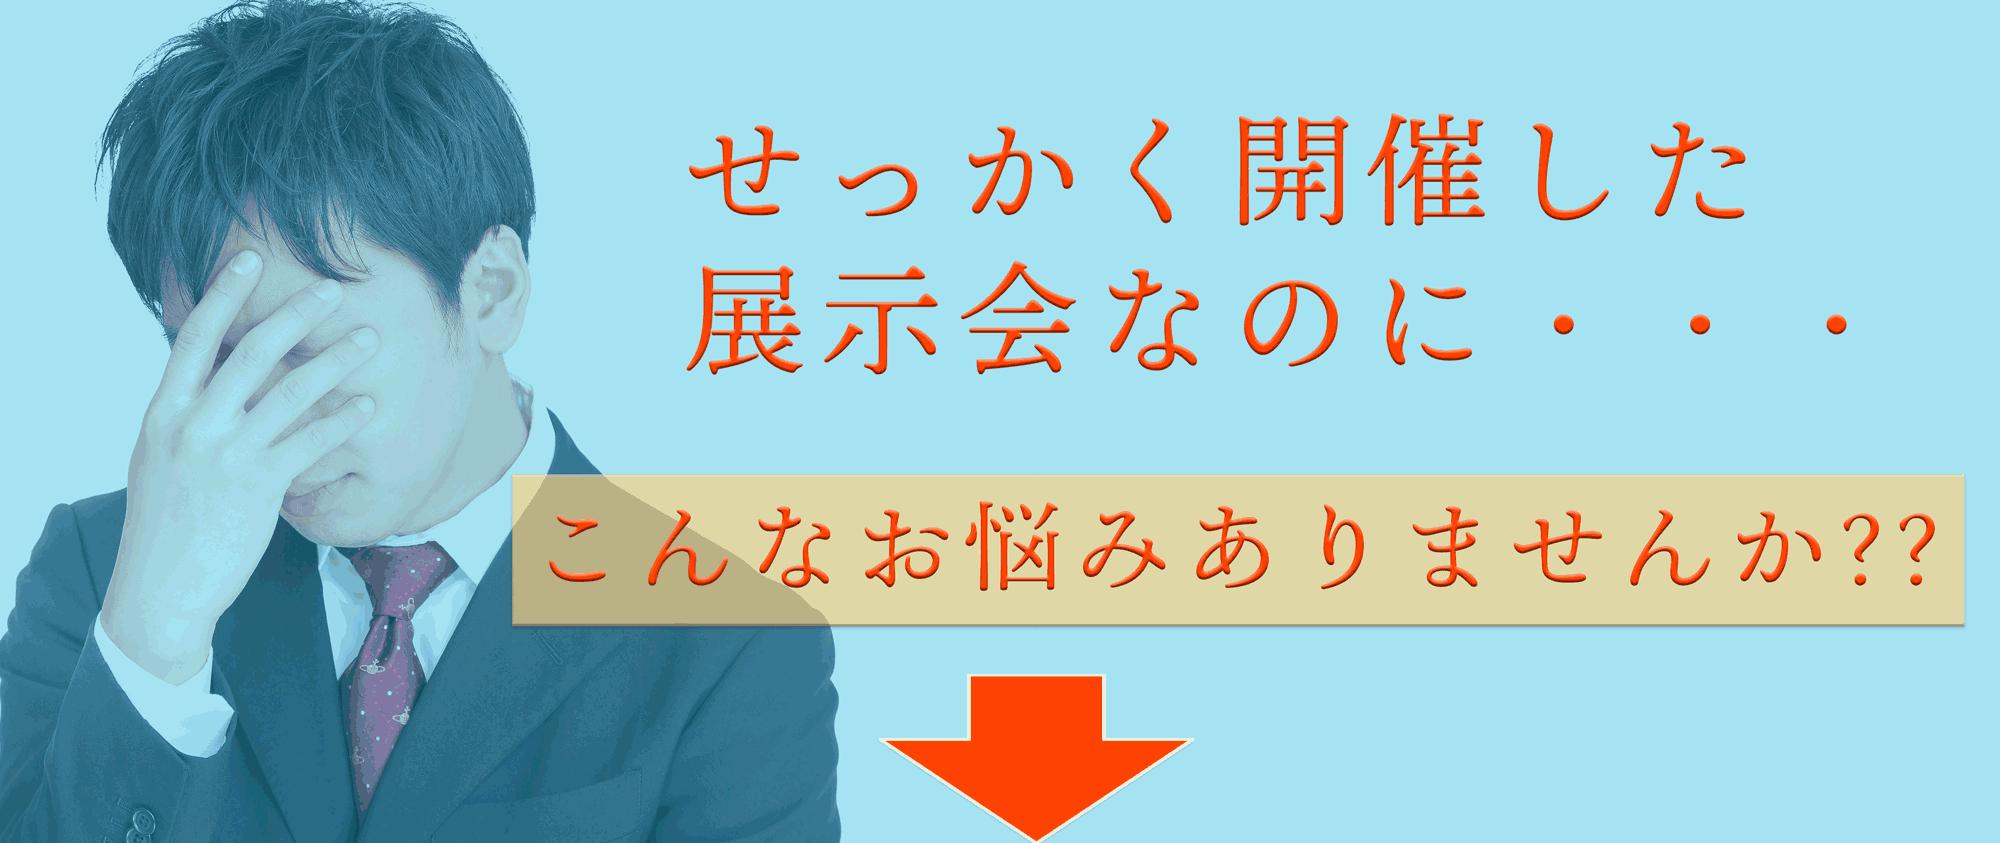 VR展示会_お悩み